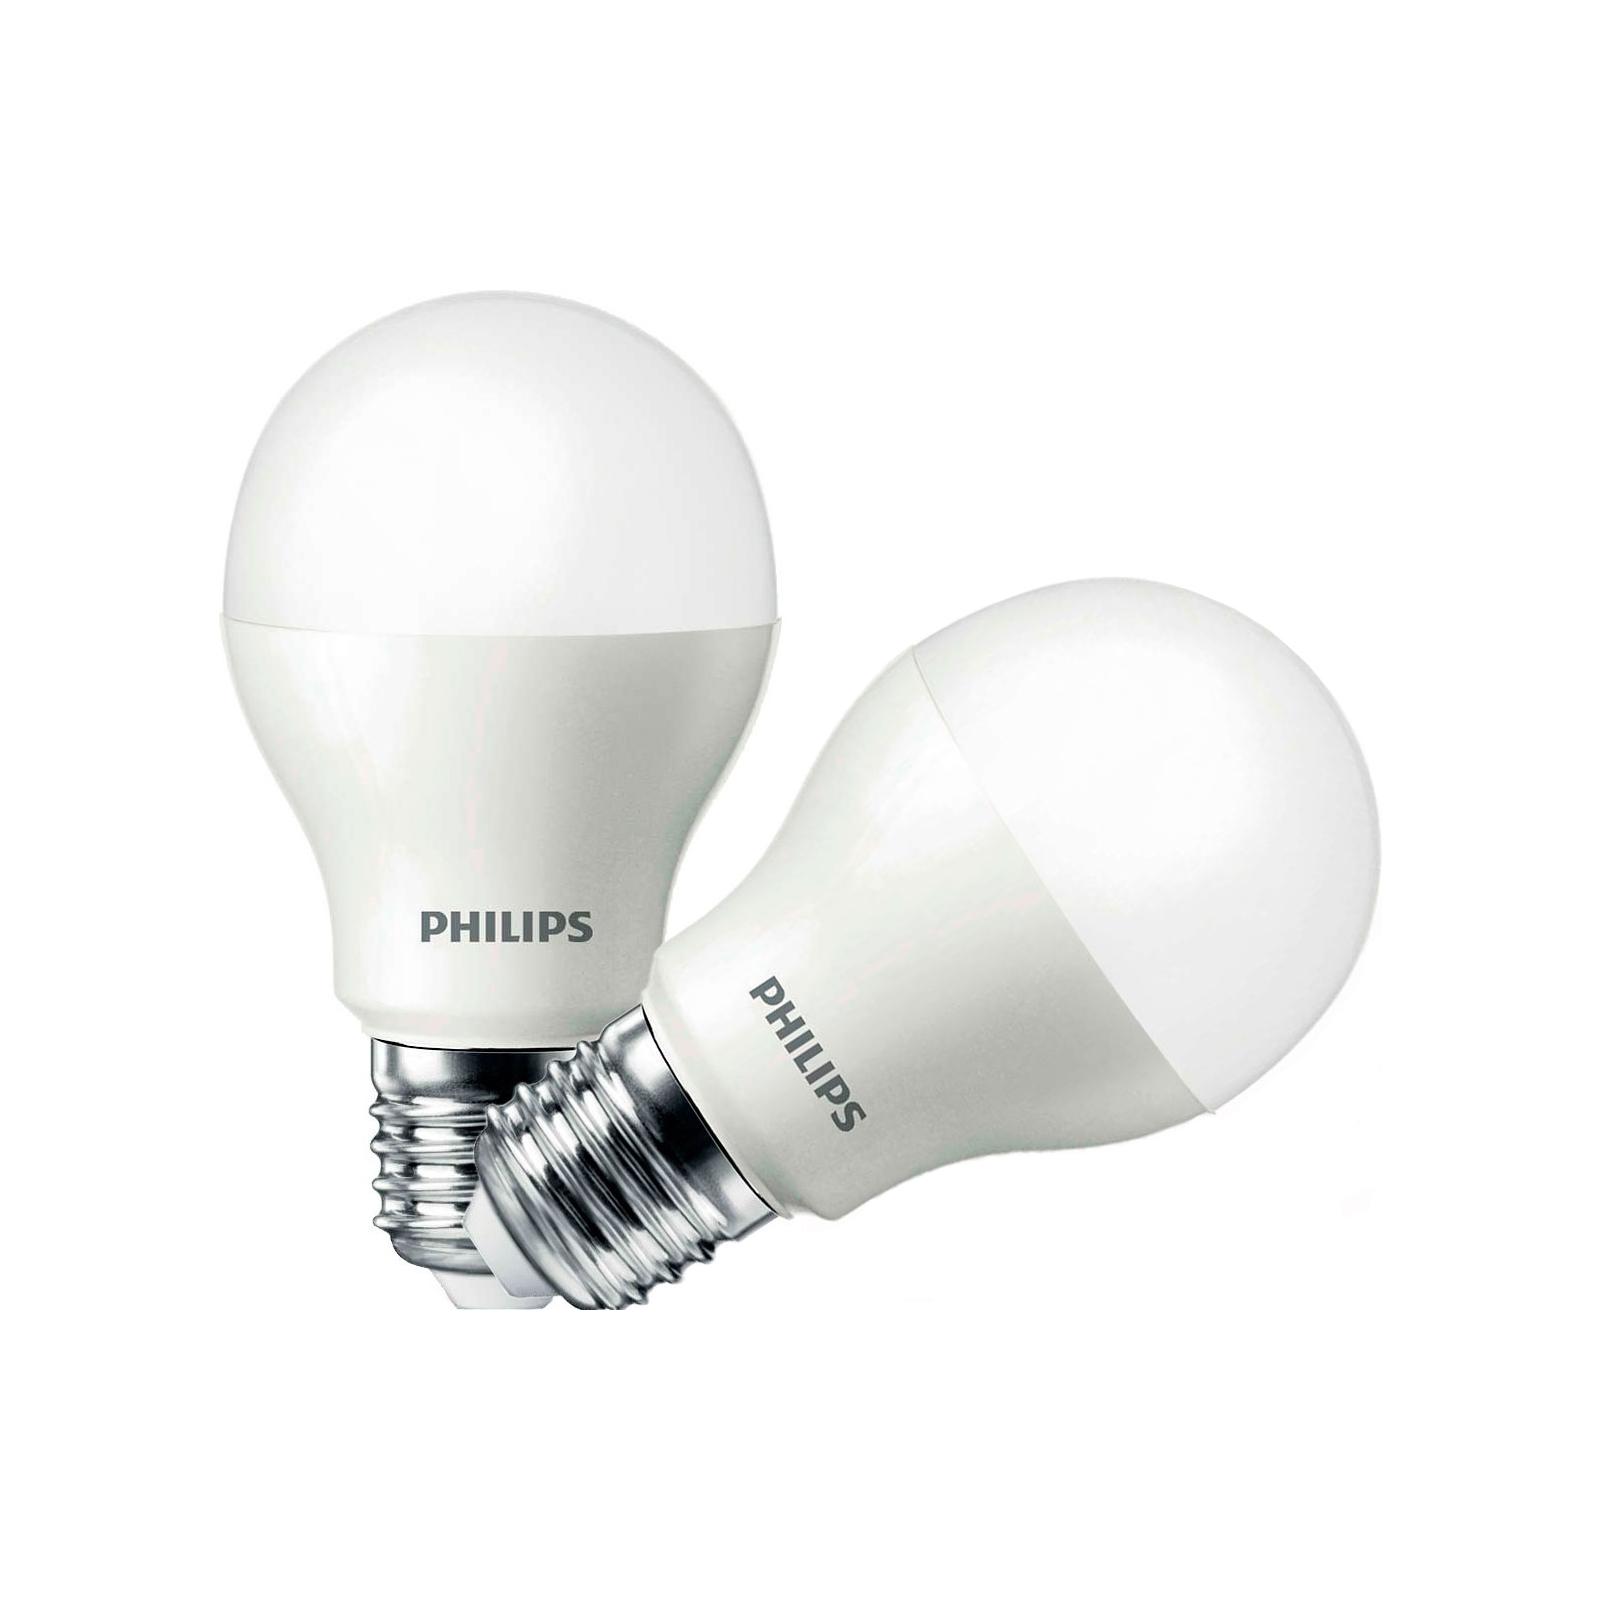 Лампочка PHILIPS LEDBulb E27 10.5-85W 3000K 230V A55 (1+1) (8727900270105)